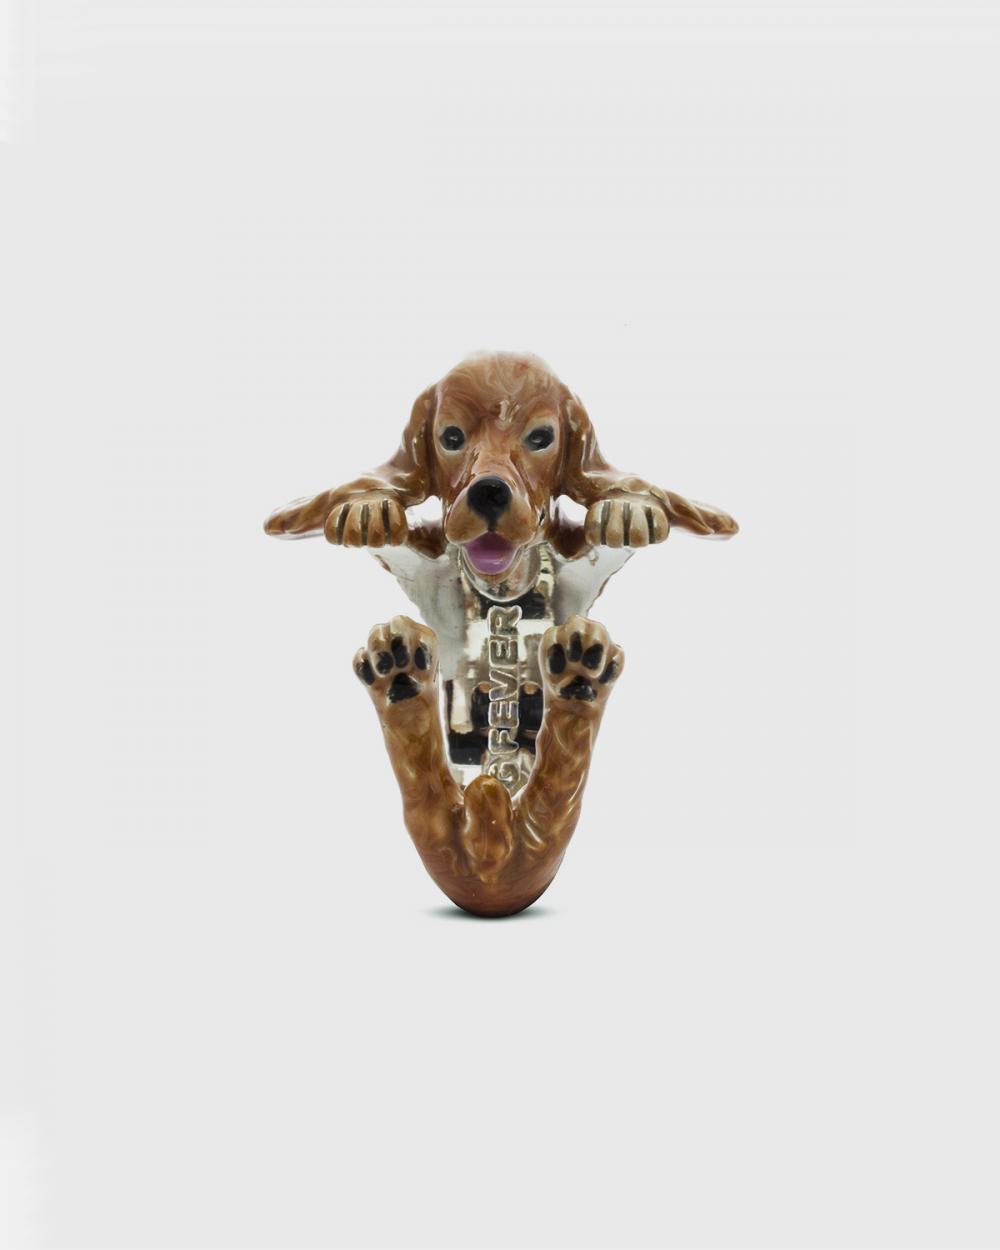 Dog Fever ENGLISH COCKER SPANIEL HUG RING / ENAMELLED NOVE25